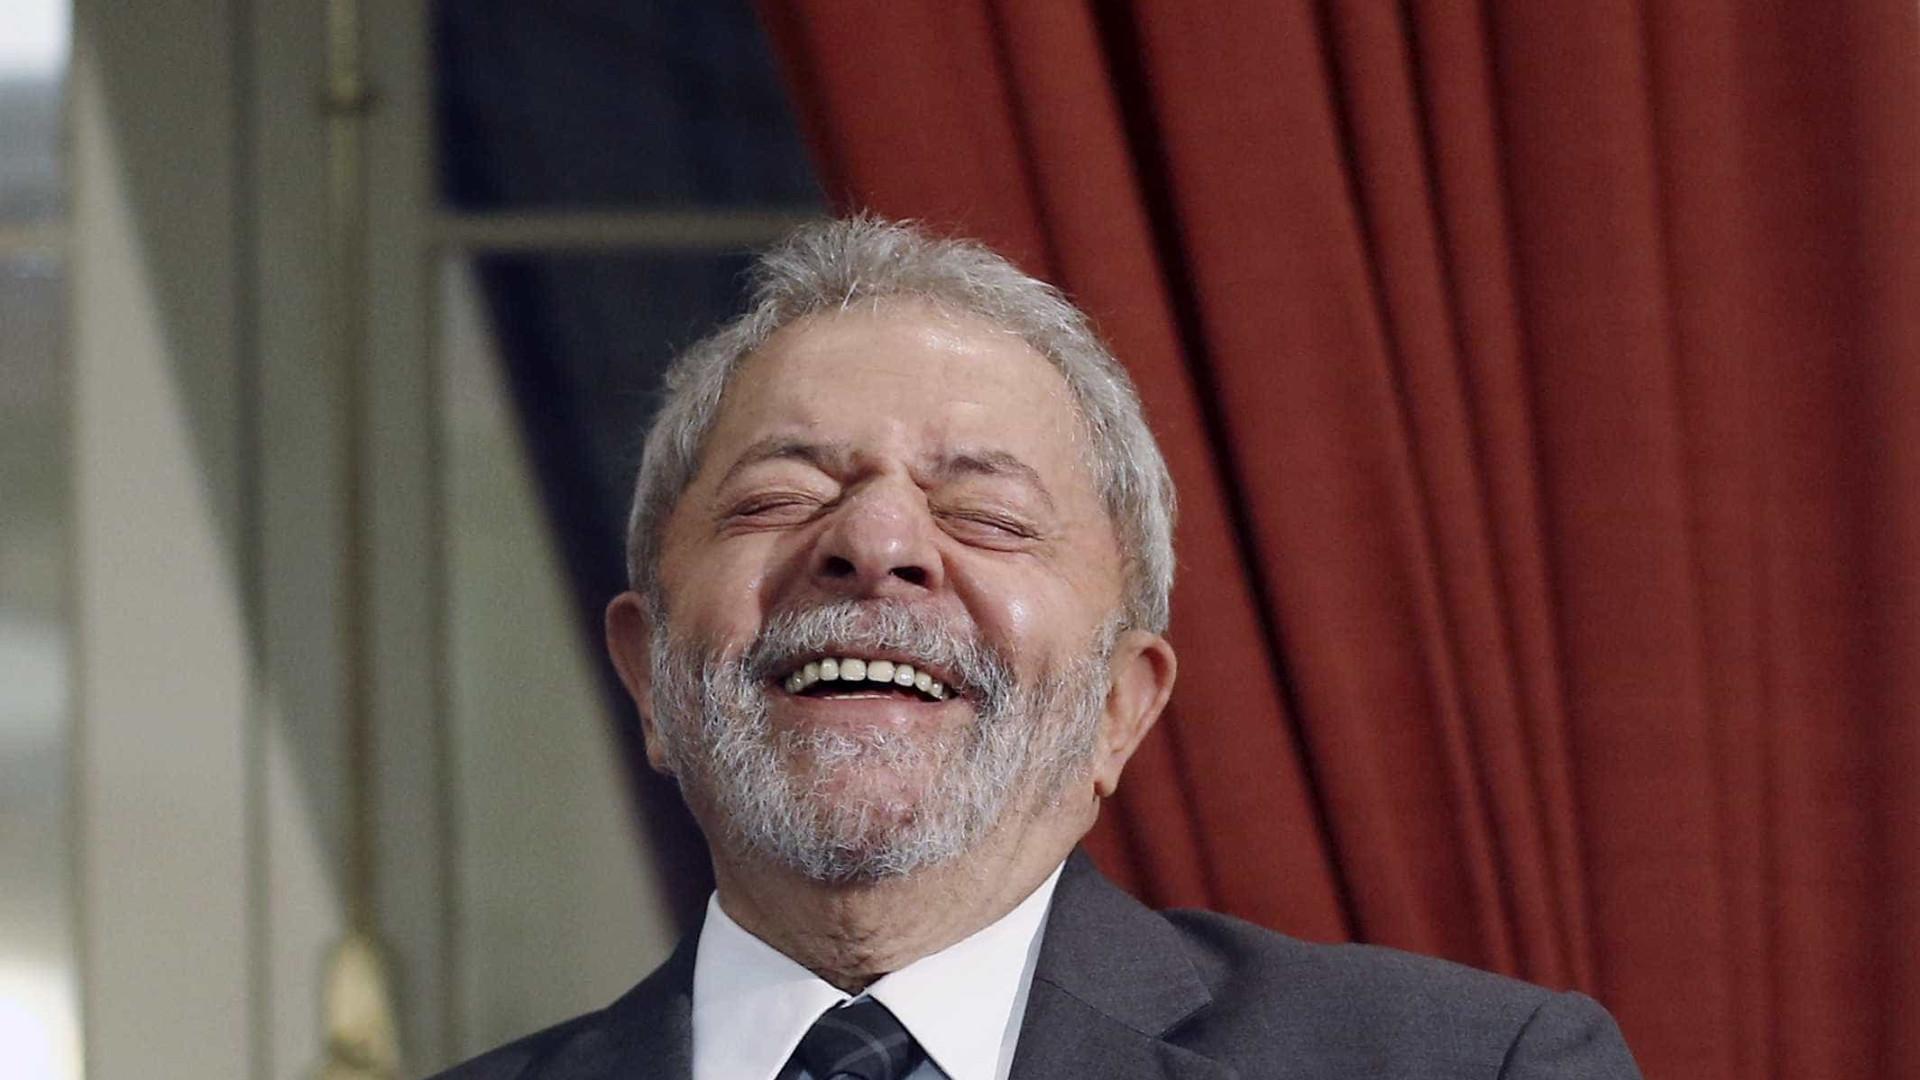 PT espera que STF garanta Lula na disputa presidencial de 2018